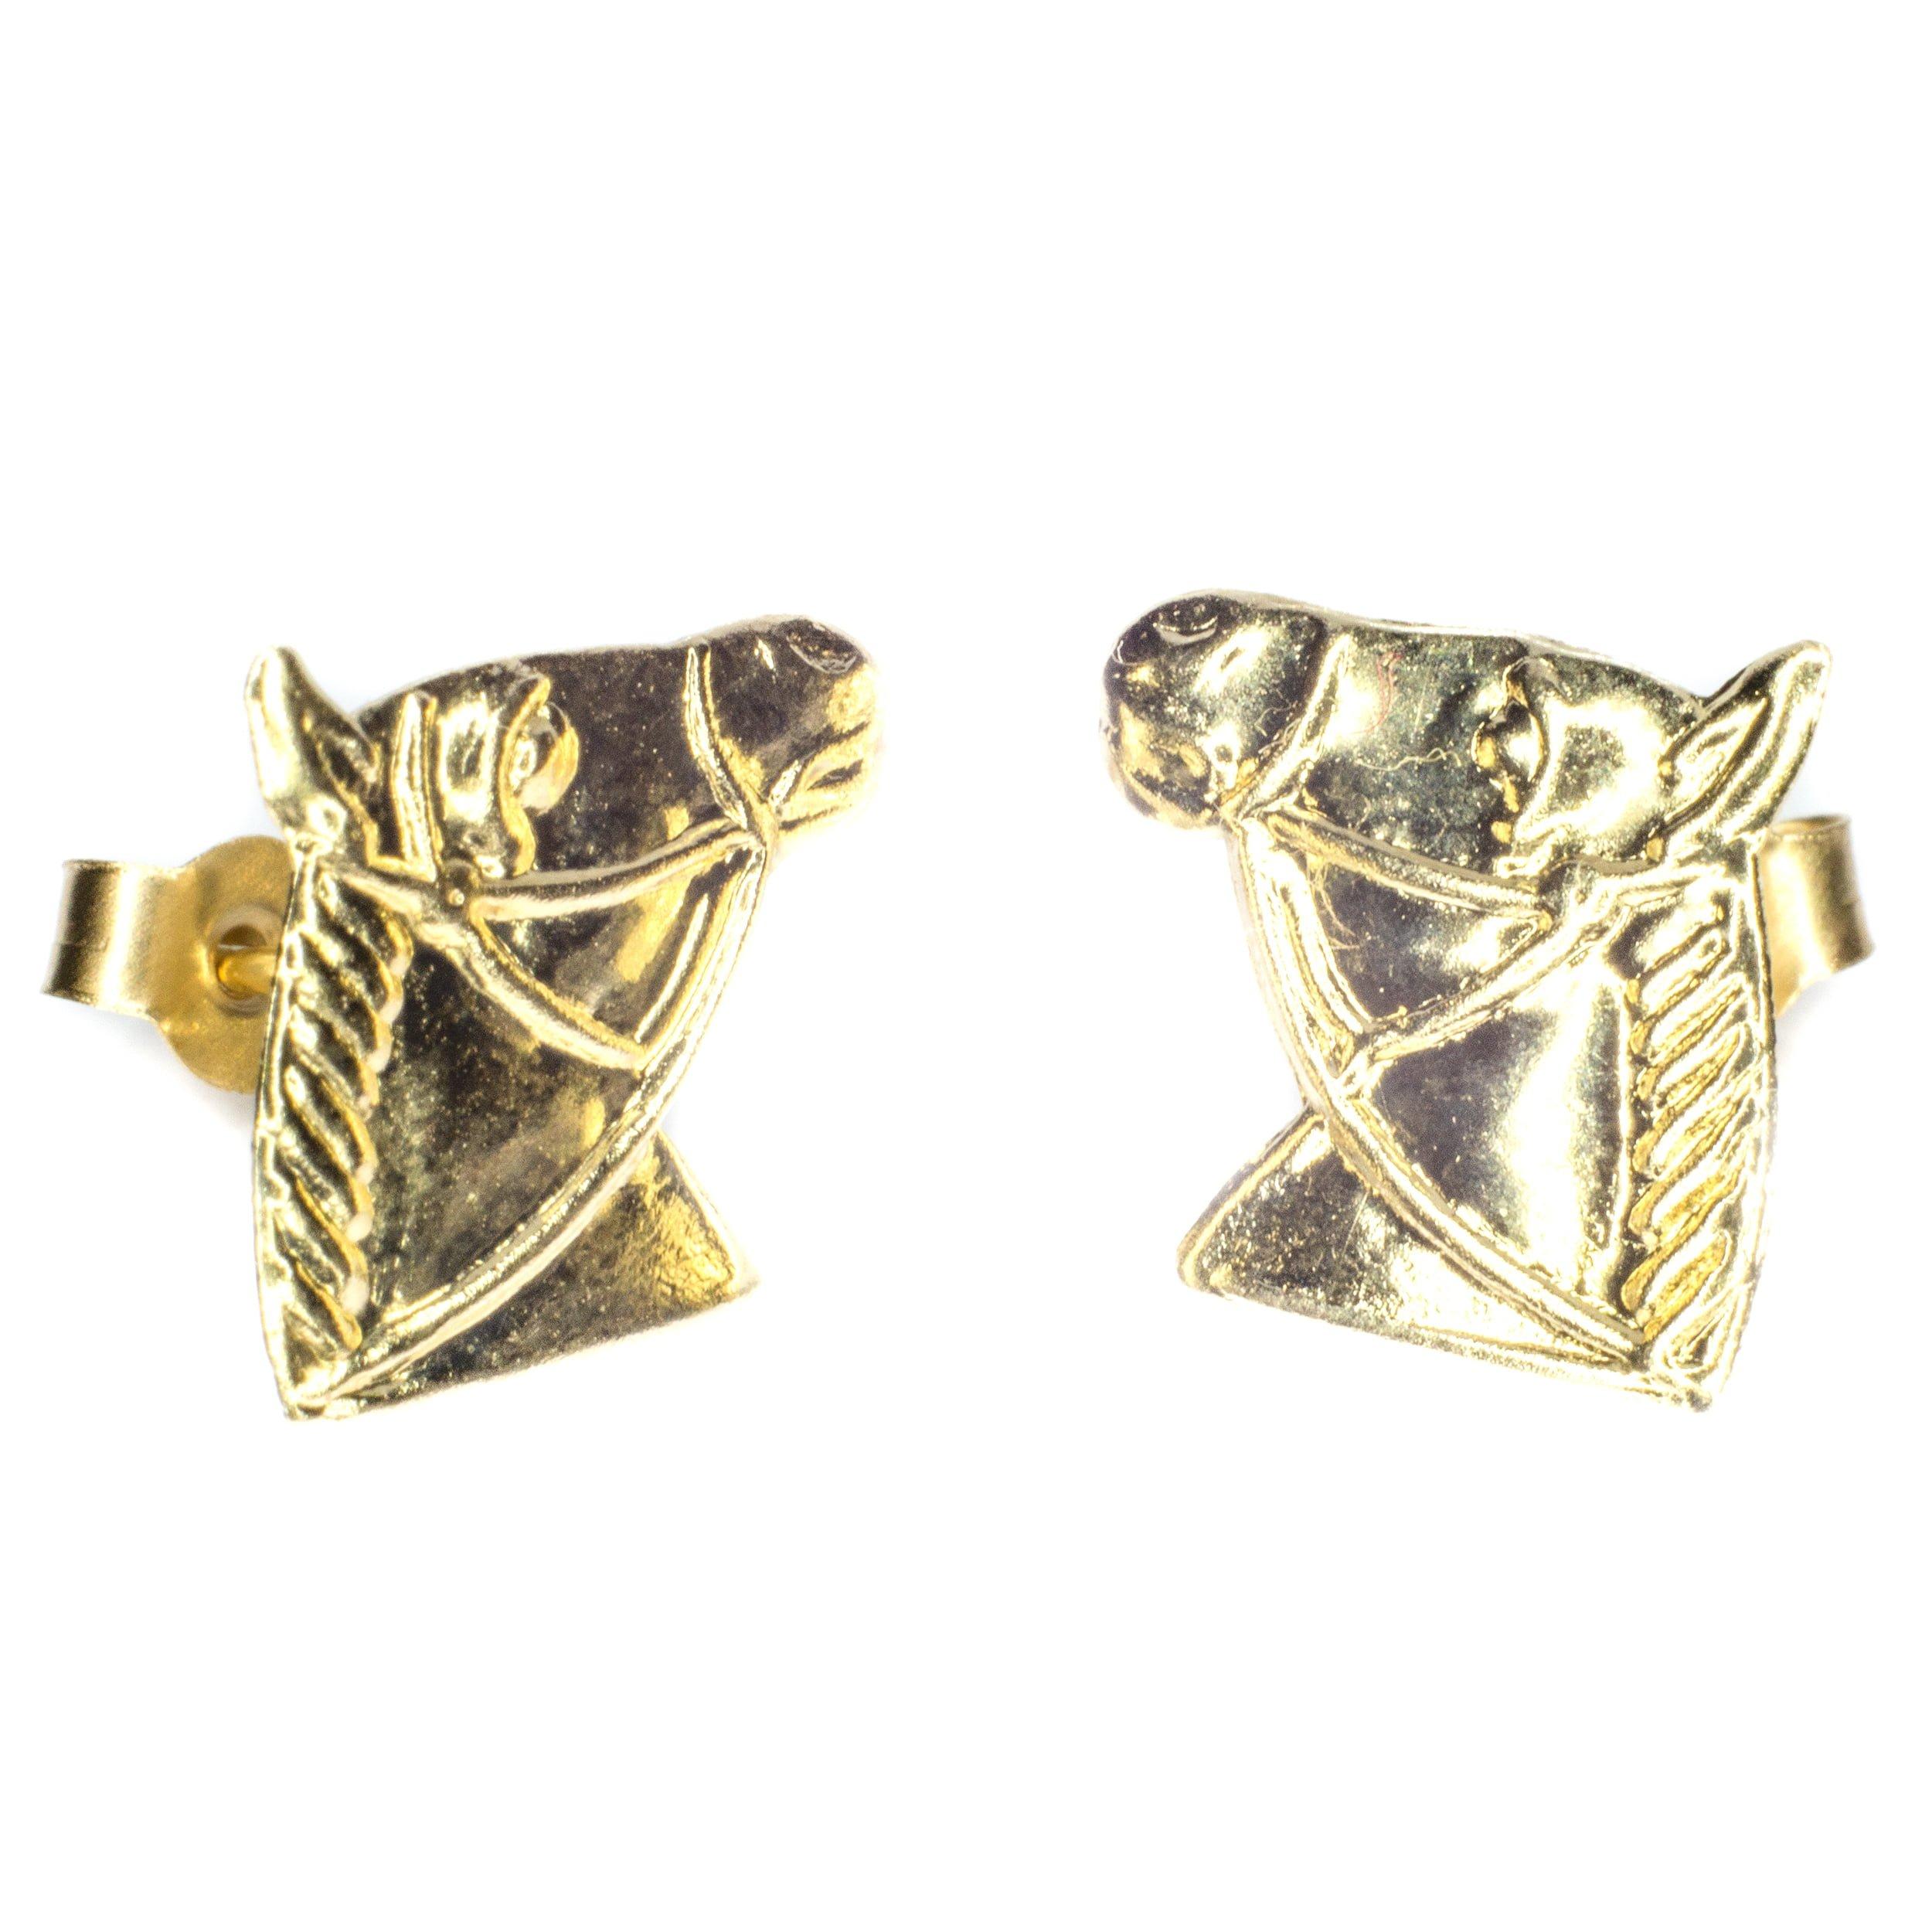 10mm horse head 9ct yellow gold stud earrings alt 2